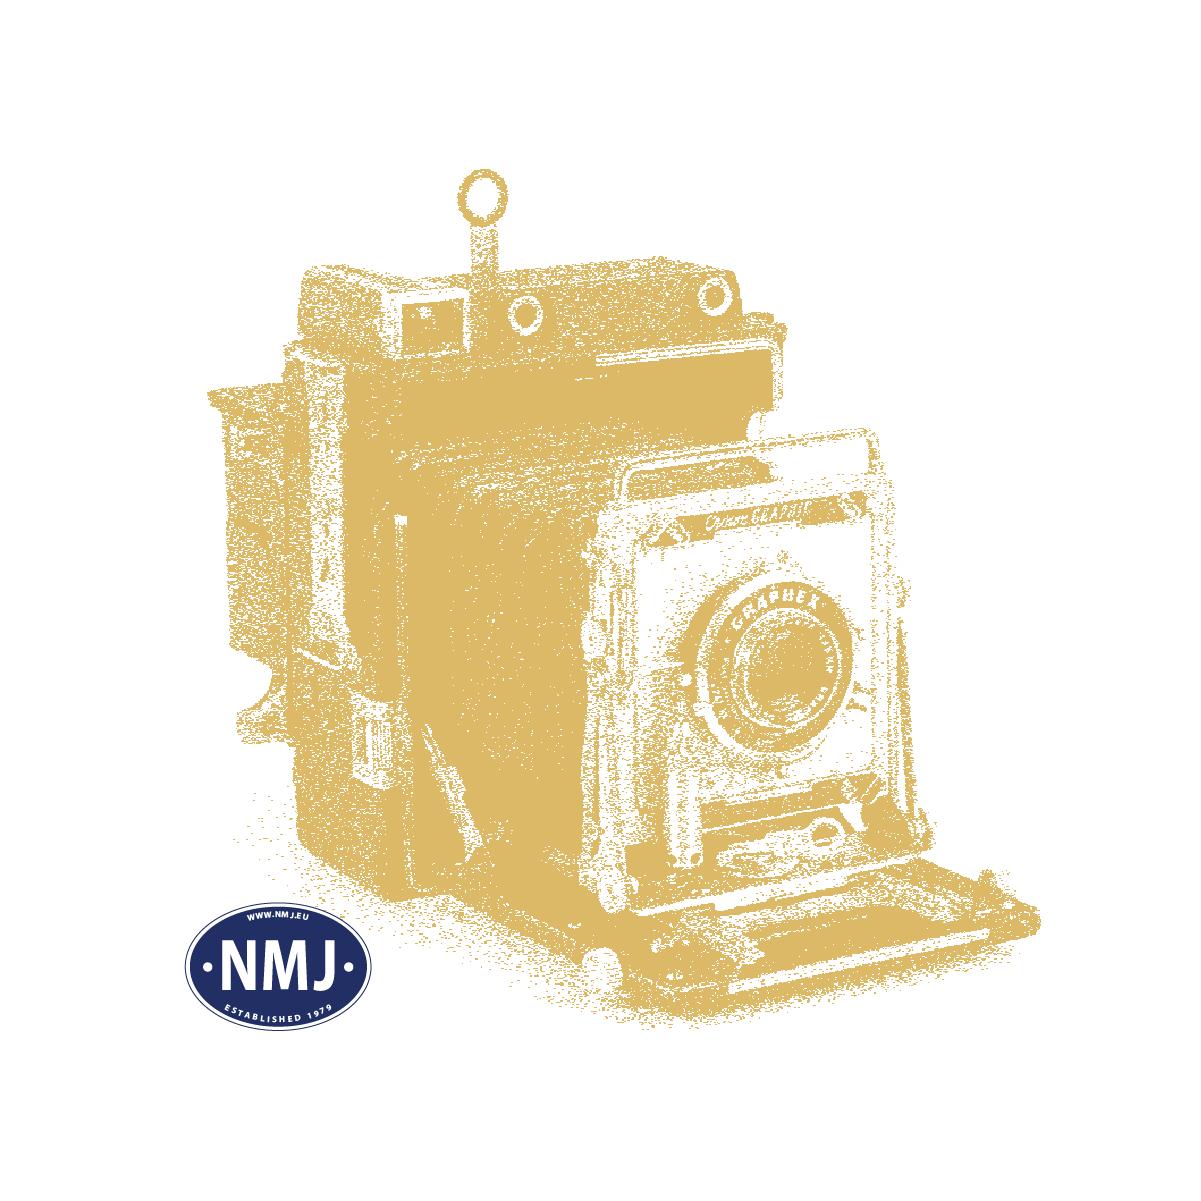 NOC36634 - Stallarbeid, N-Skala